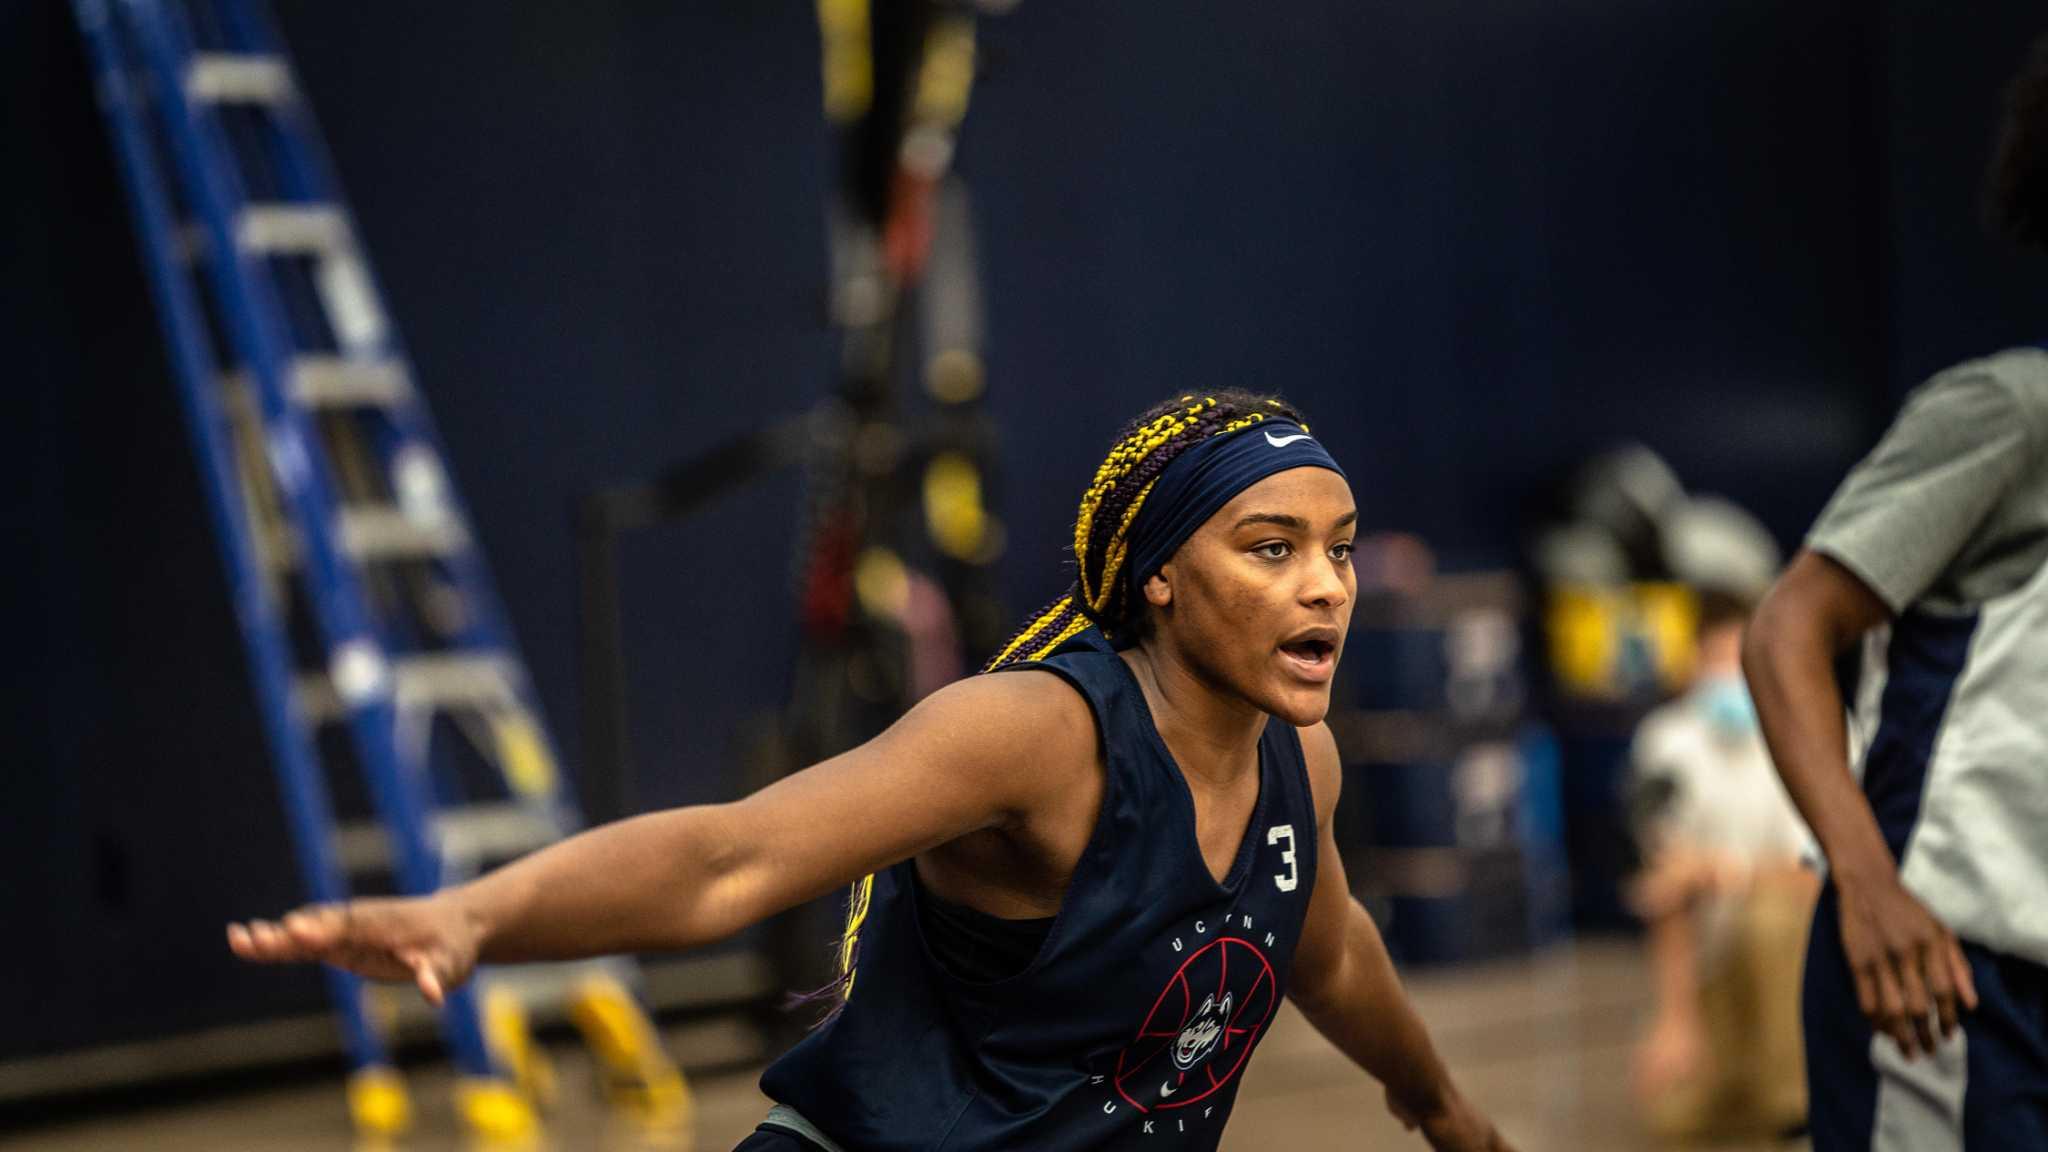 The next Napheesa Collier? UConn freshman Aaliyah Edwards drawing big comparisons